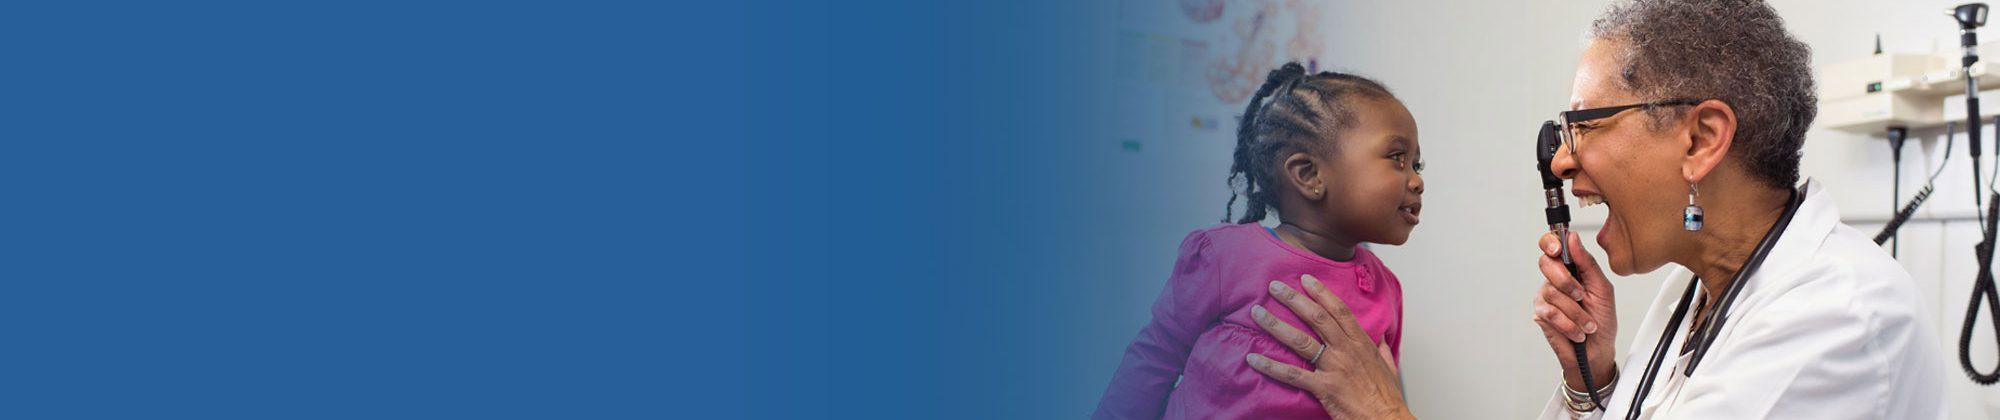 Smart Pediatrics Resources e1535645051988 1 - Smart Pediatrics Resource Center